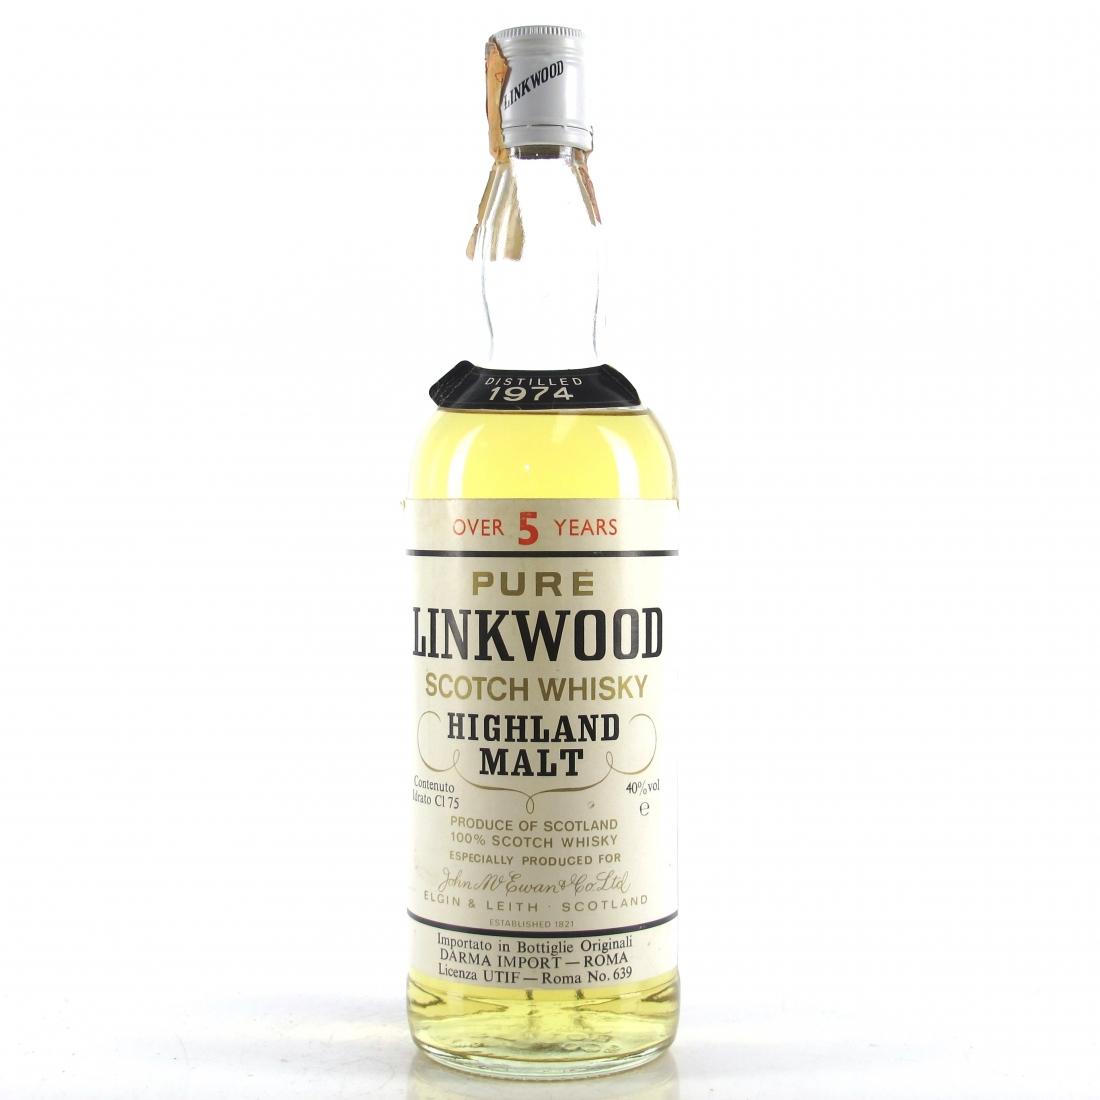 Linkwood 1974 5 Year Old